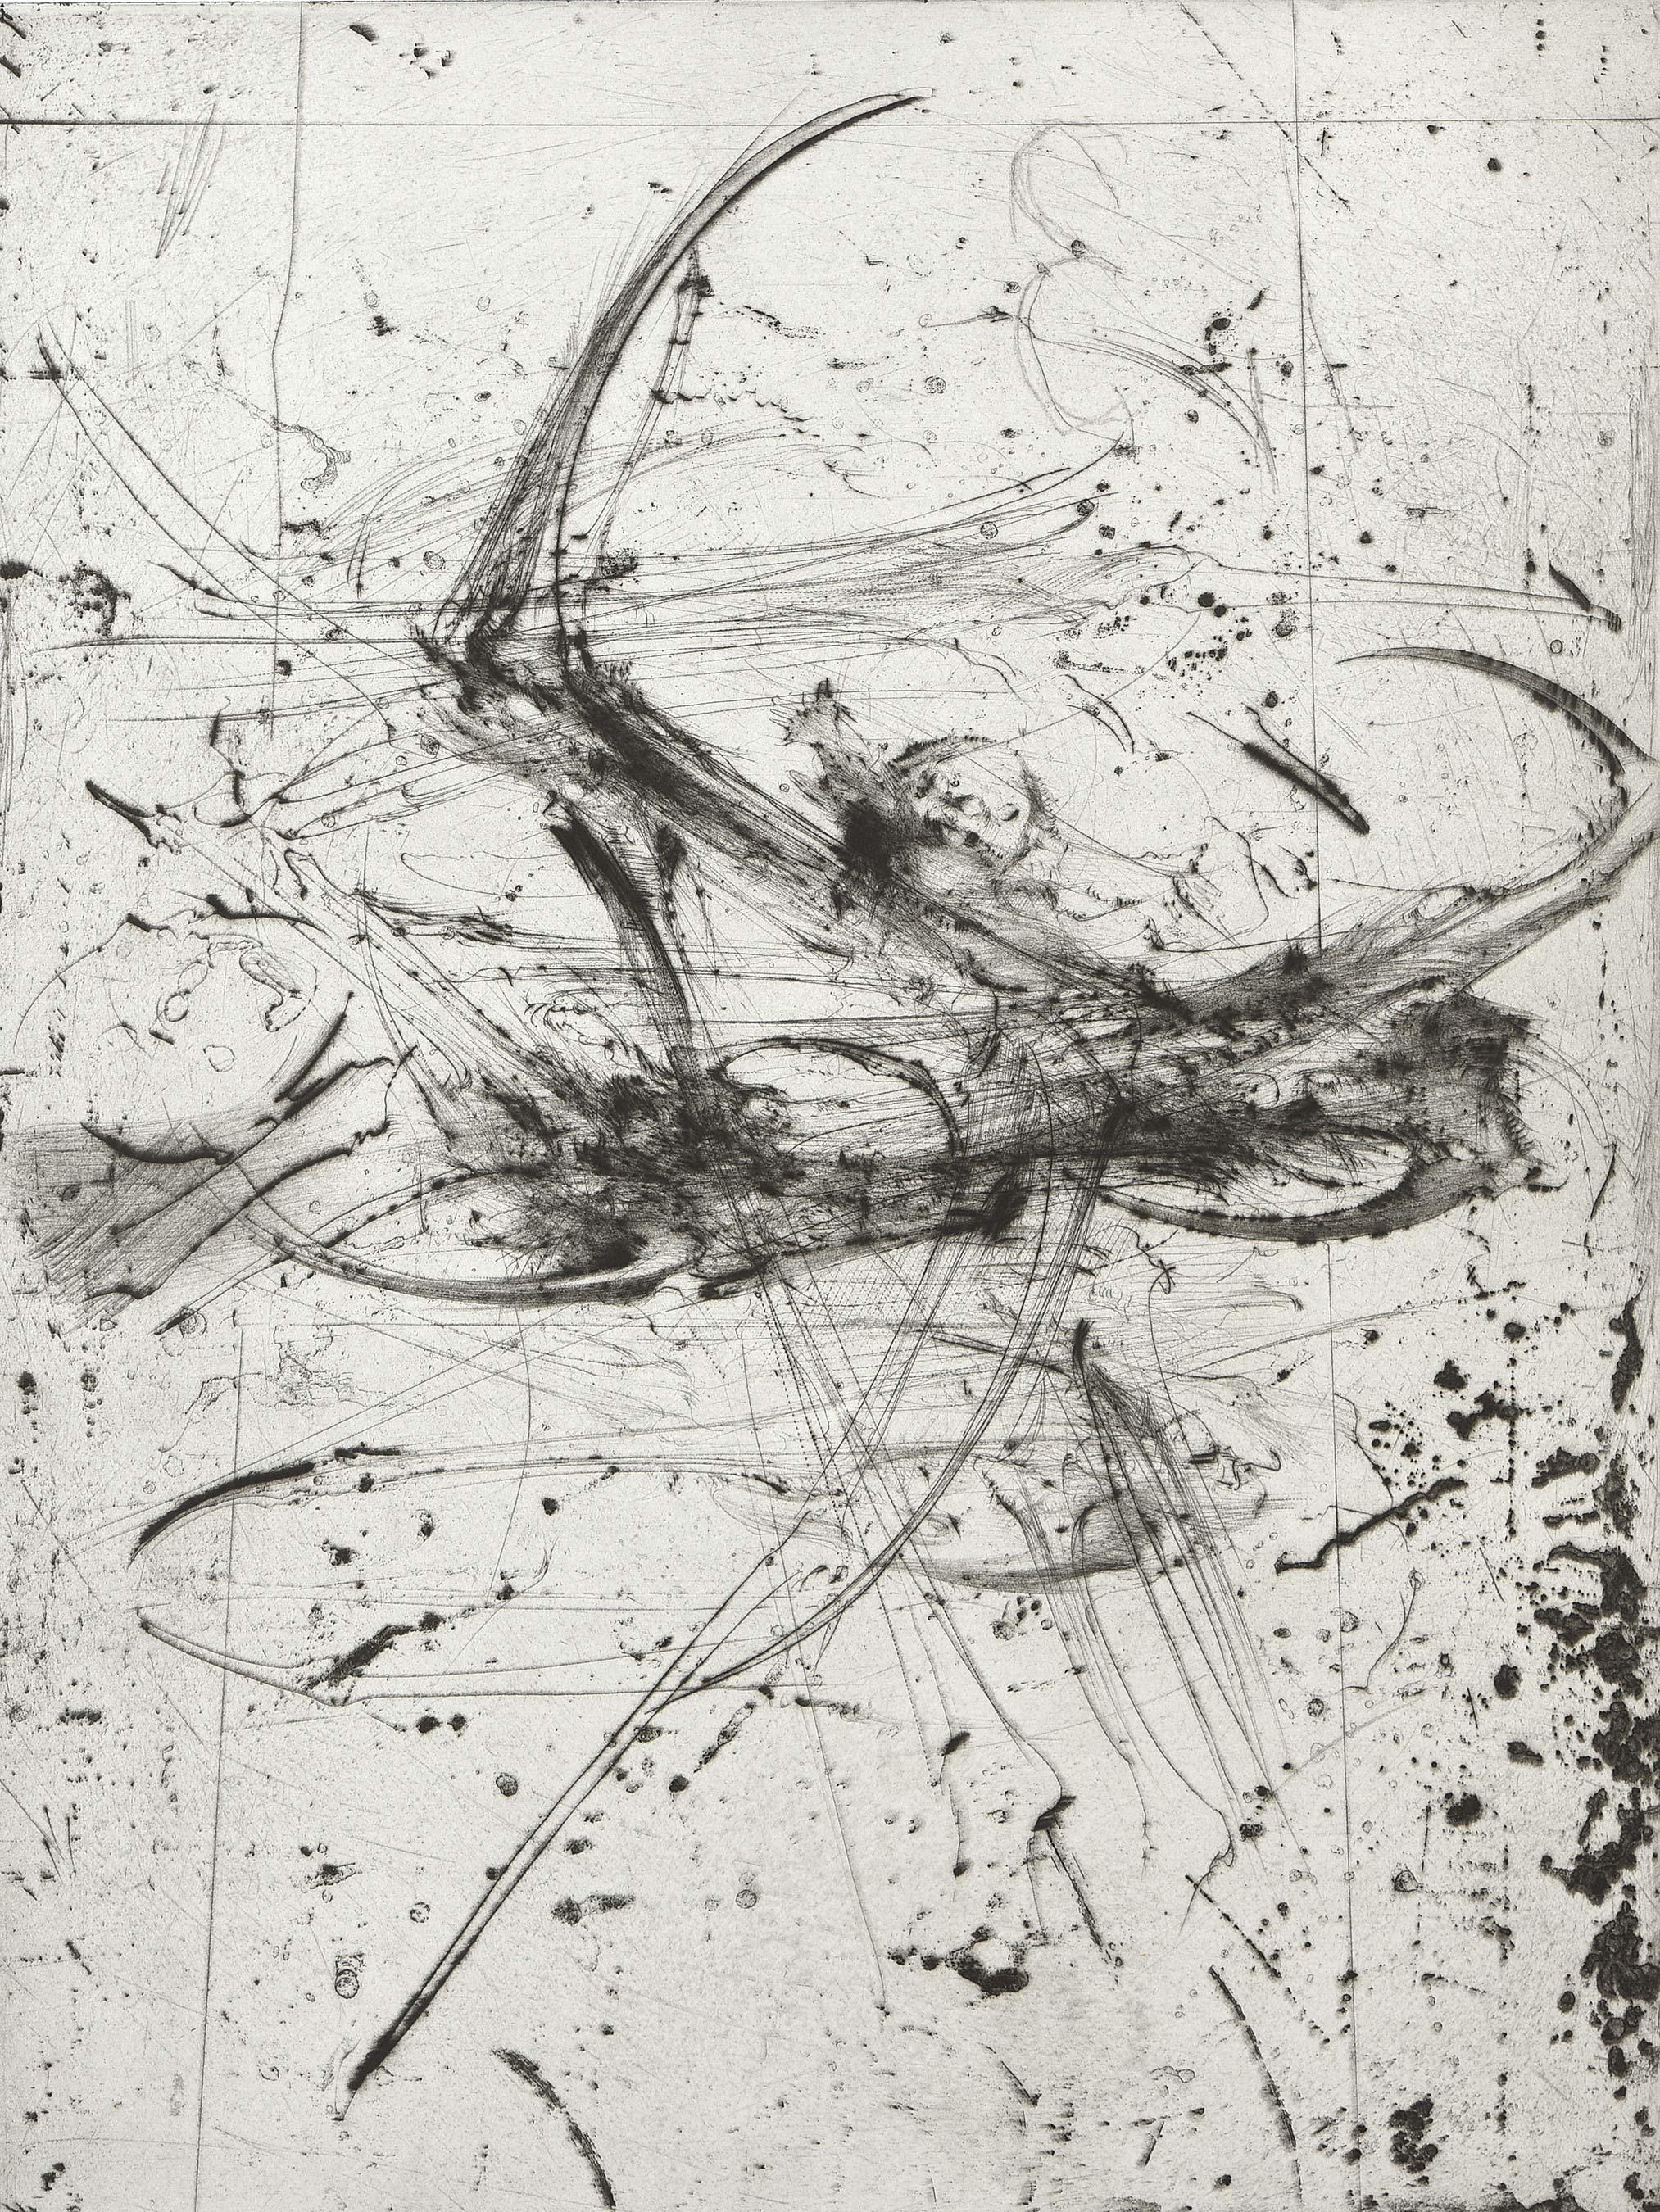 Print by Dado, 1981-1982